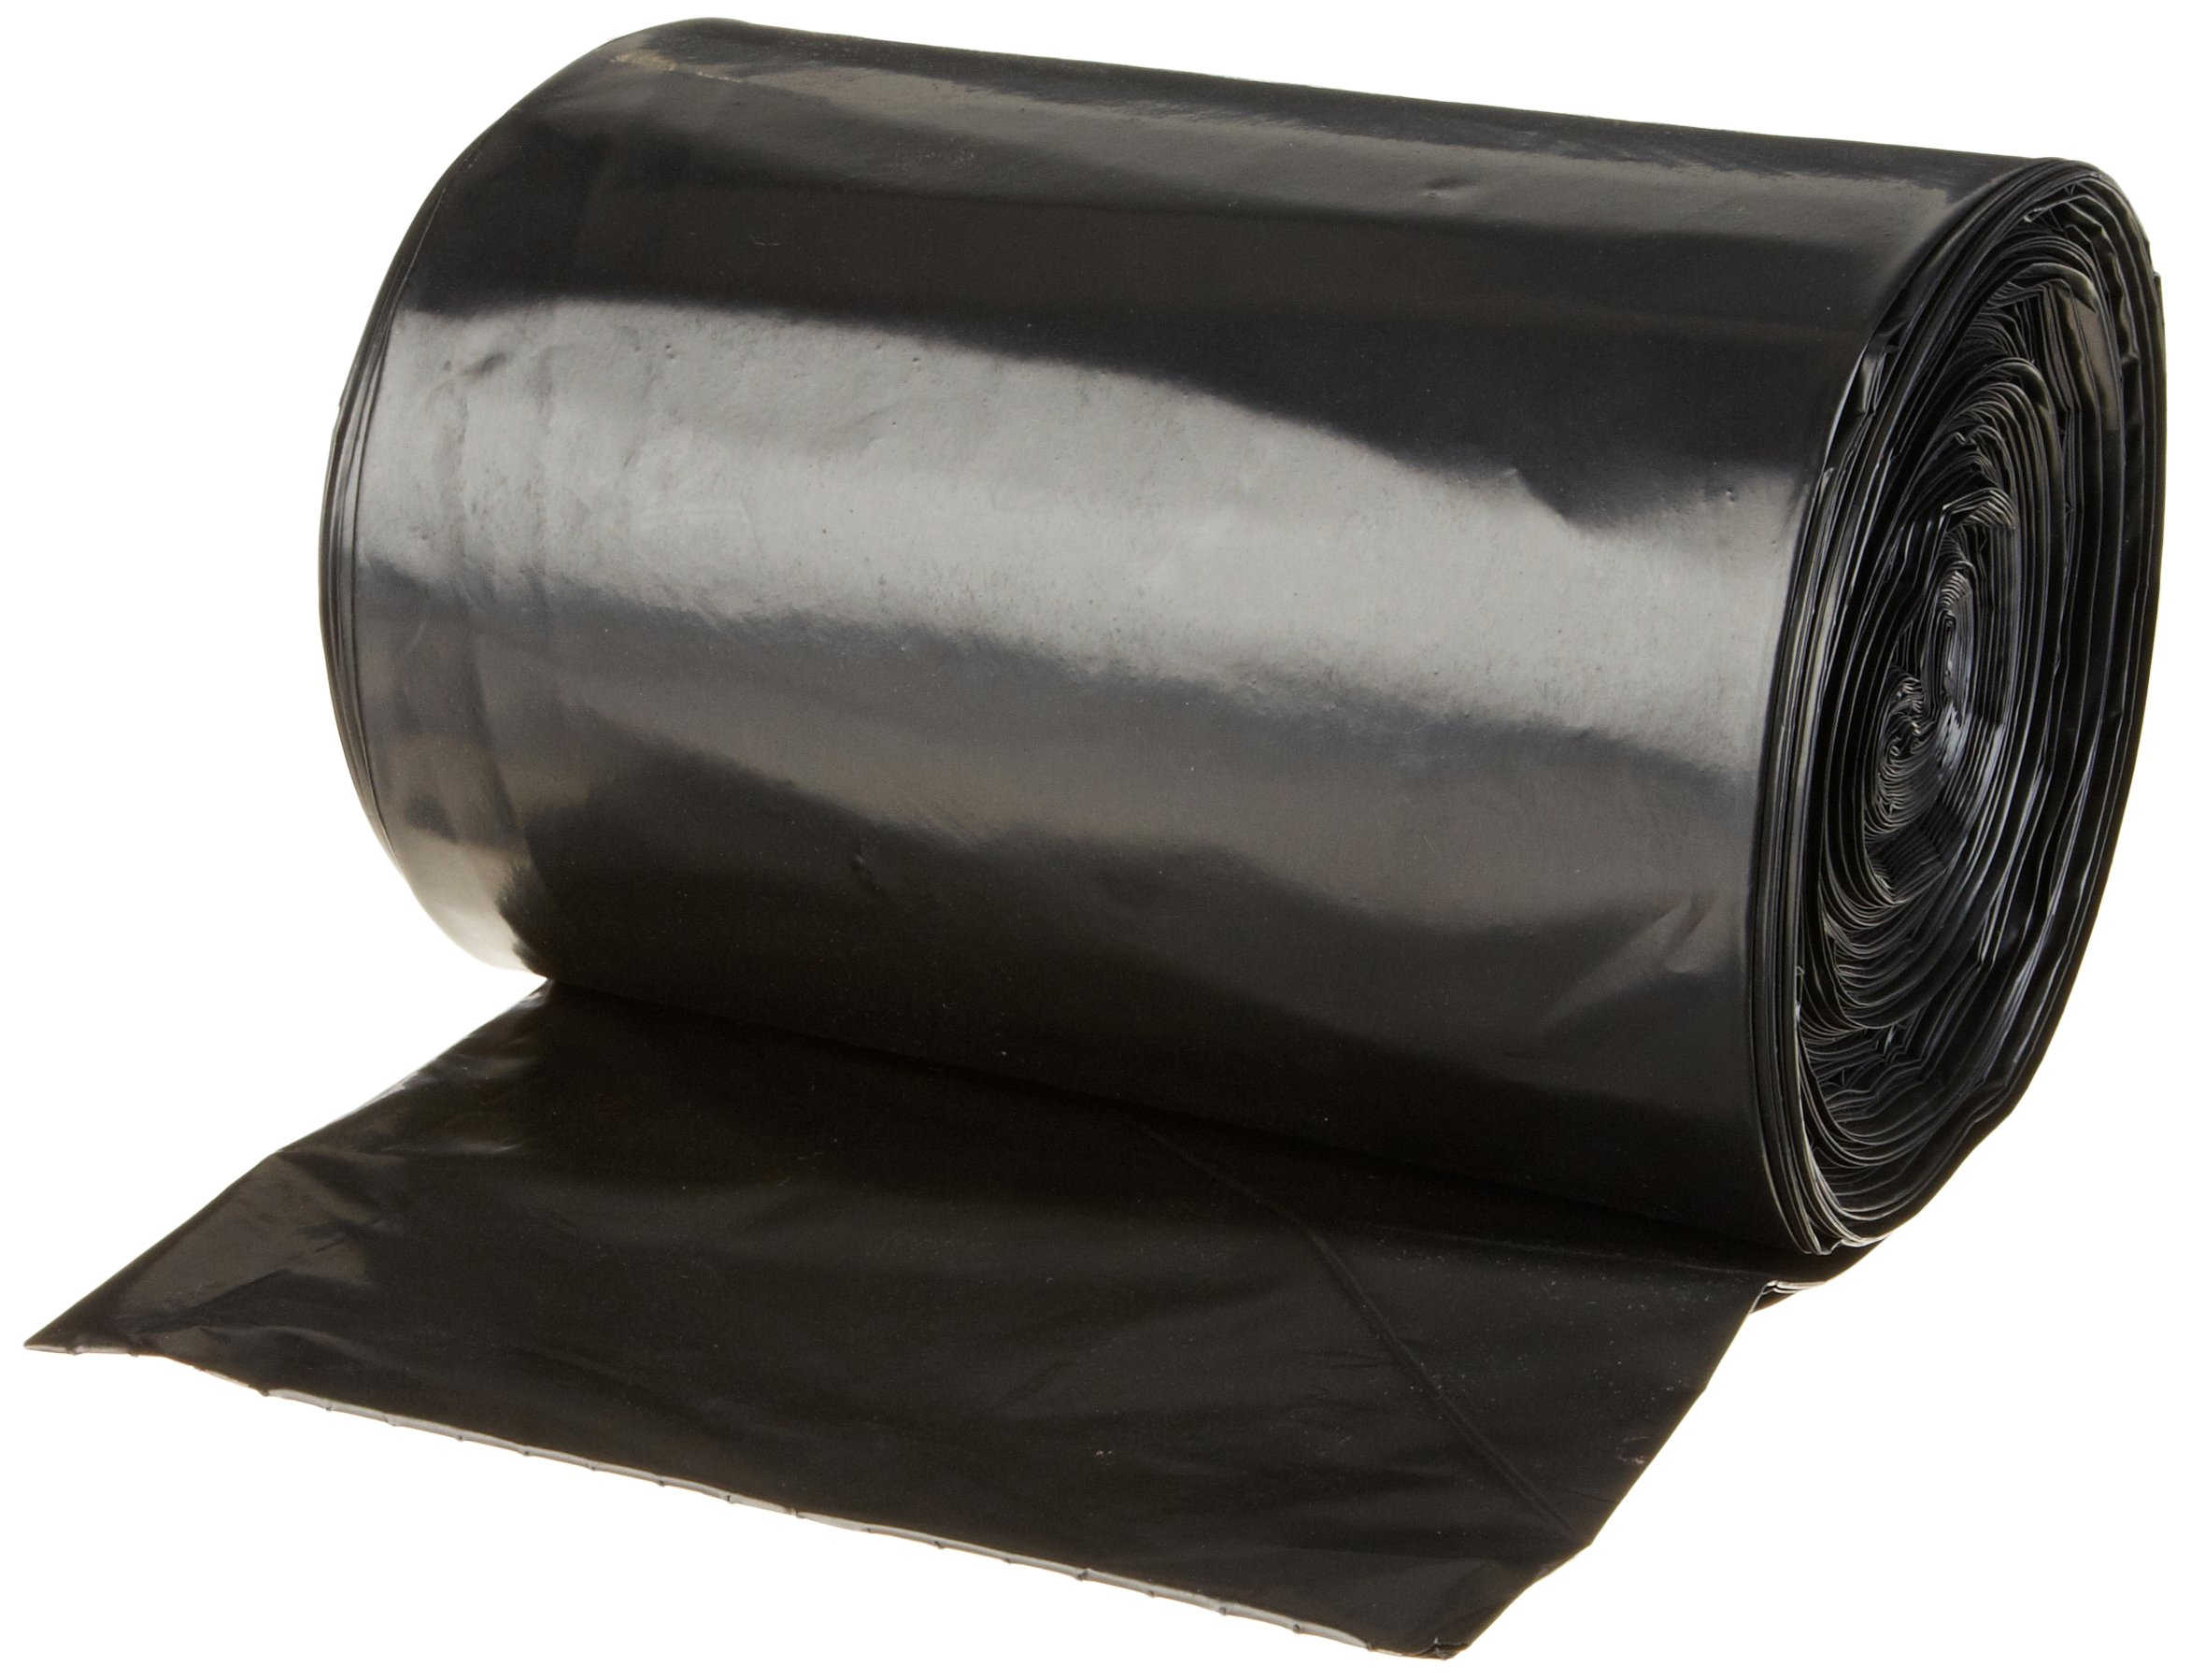 Berry Plastics 618897 Ruffies Pro Twist Tie Heavy Duty Contractor Bag, 42 Gallon Capacity, 3 mil Thick, Black (Box of 20)